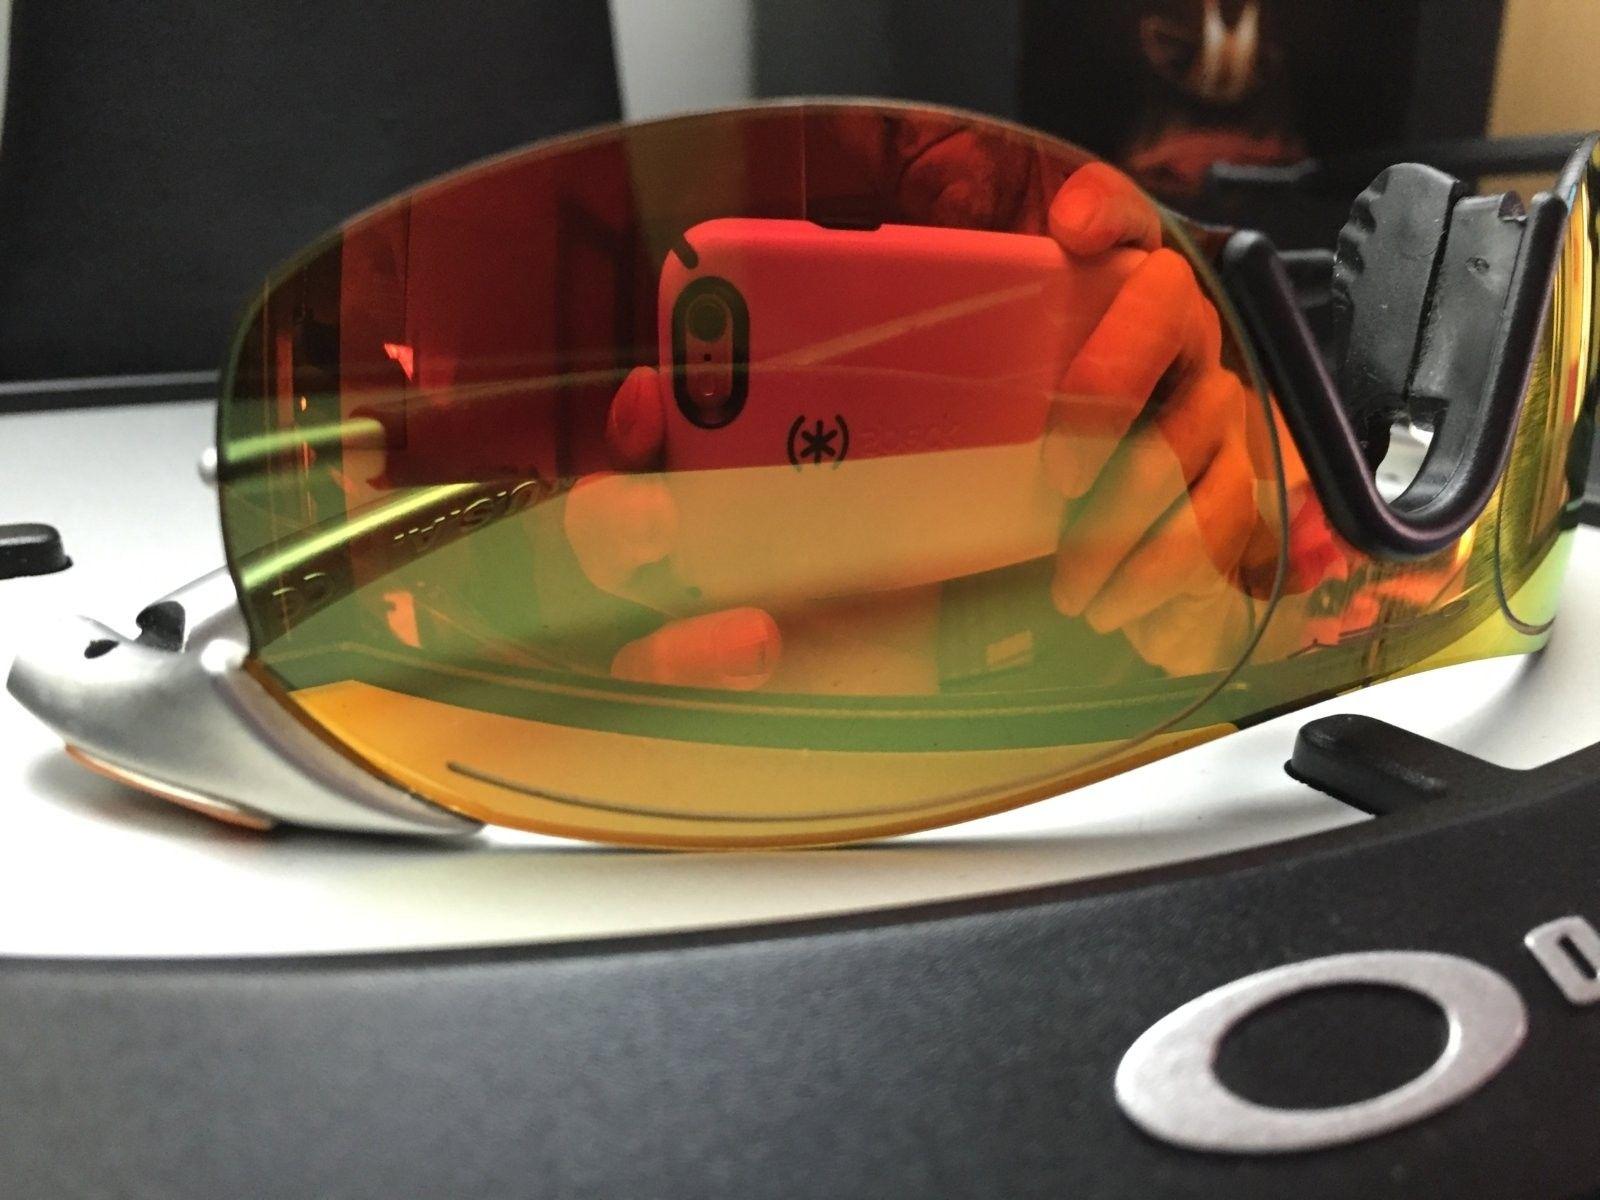 New Zero 0.4 Squared FMJ 5.56 w/ Fire Iridium SKU: 05-268 #SOLD - image.jpeg